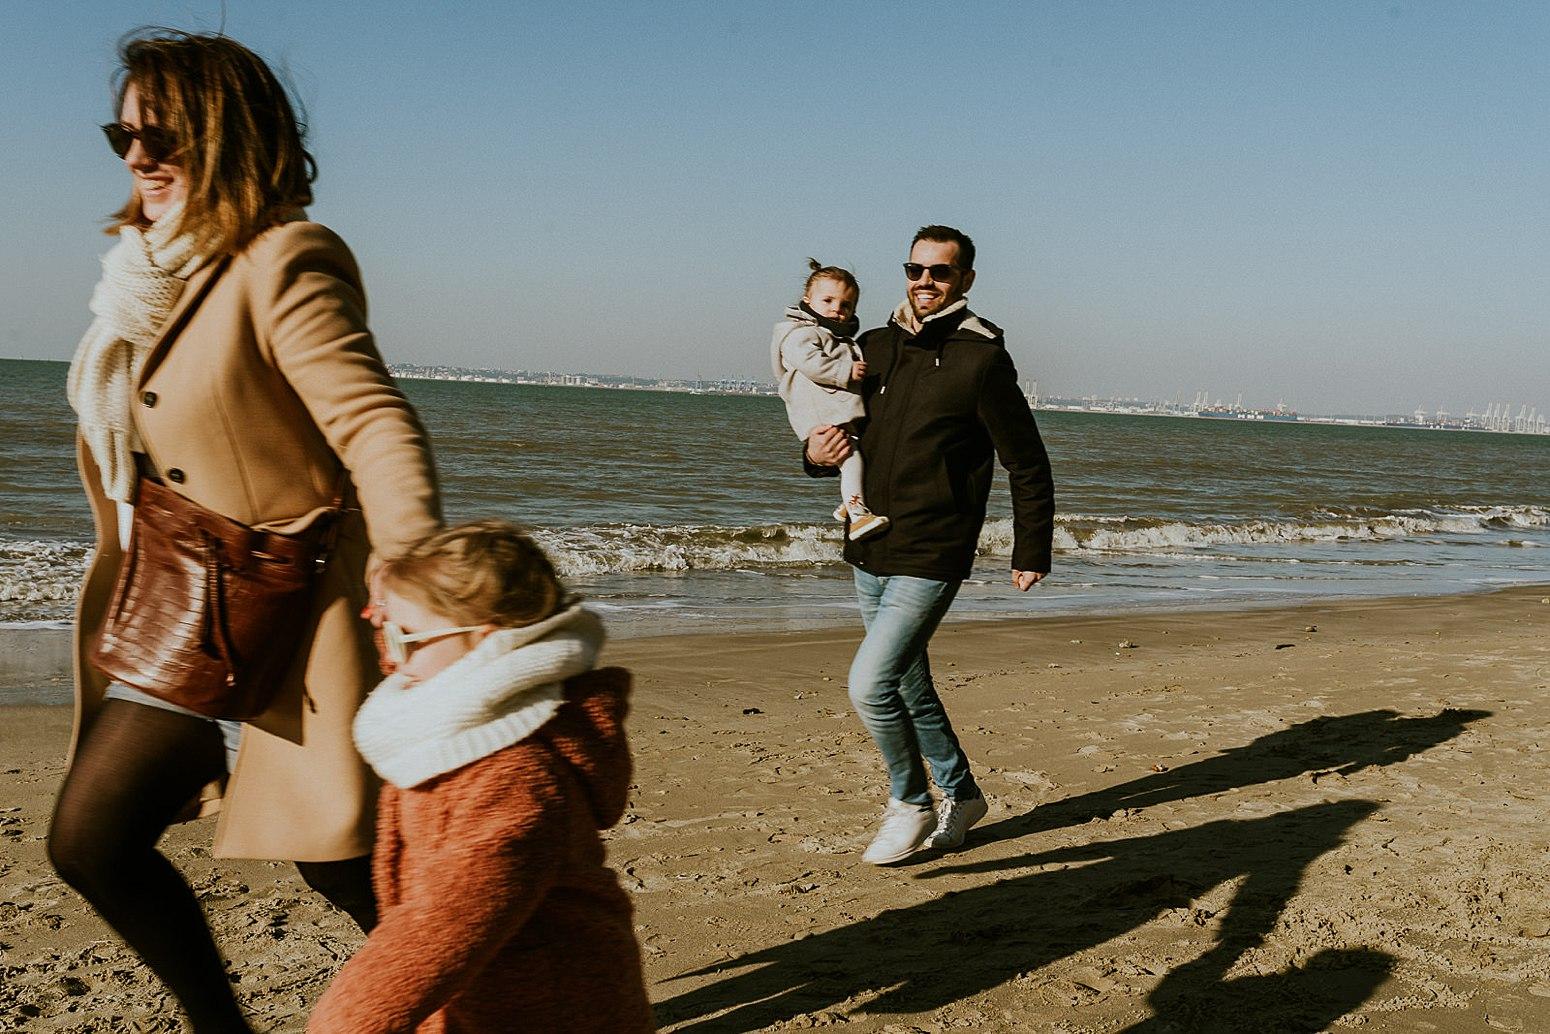 photographe-famille-normandie-plage_0012.jpg